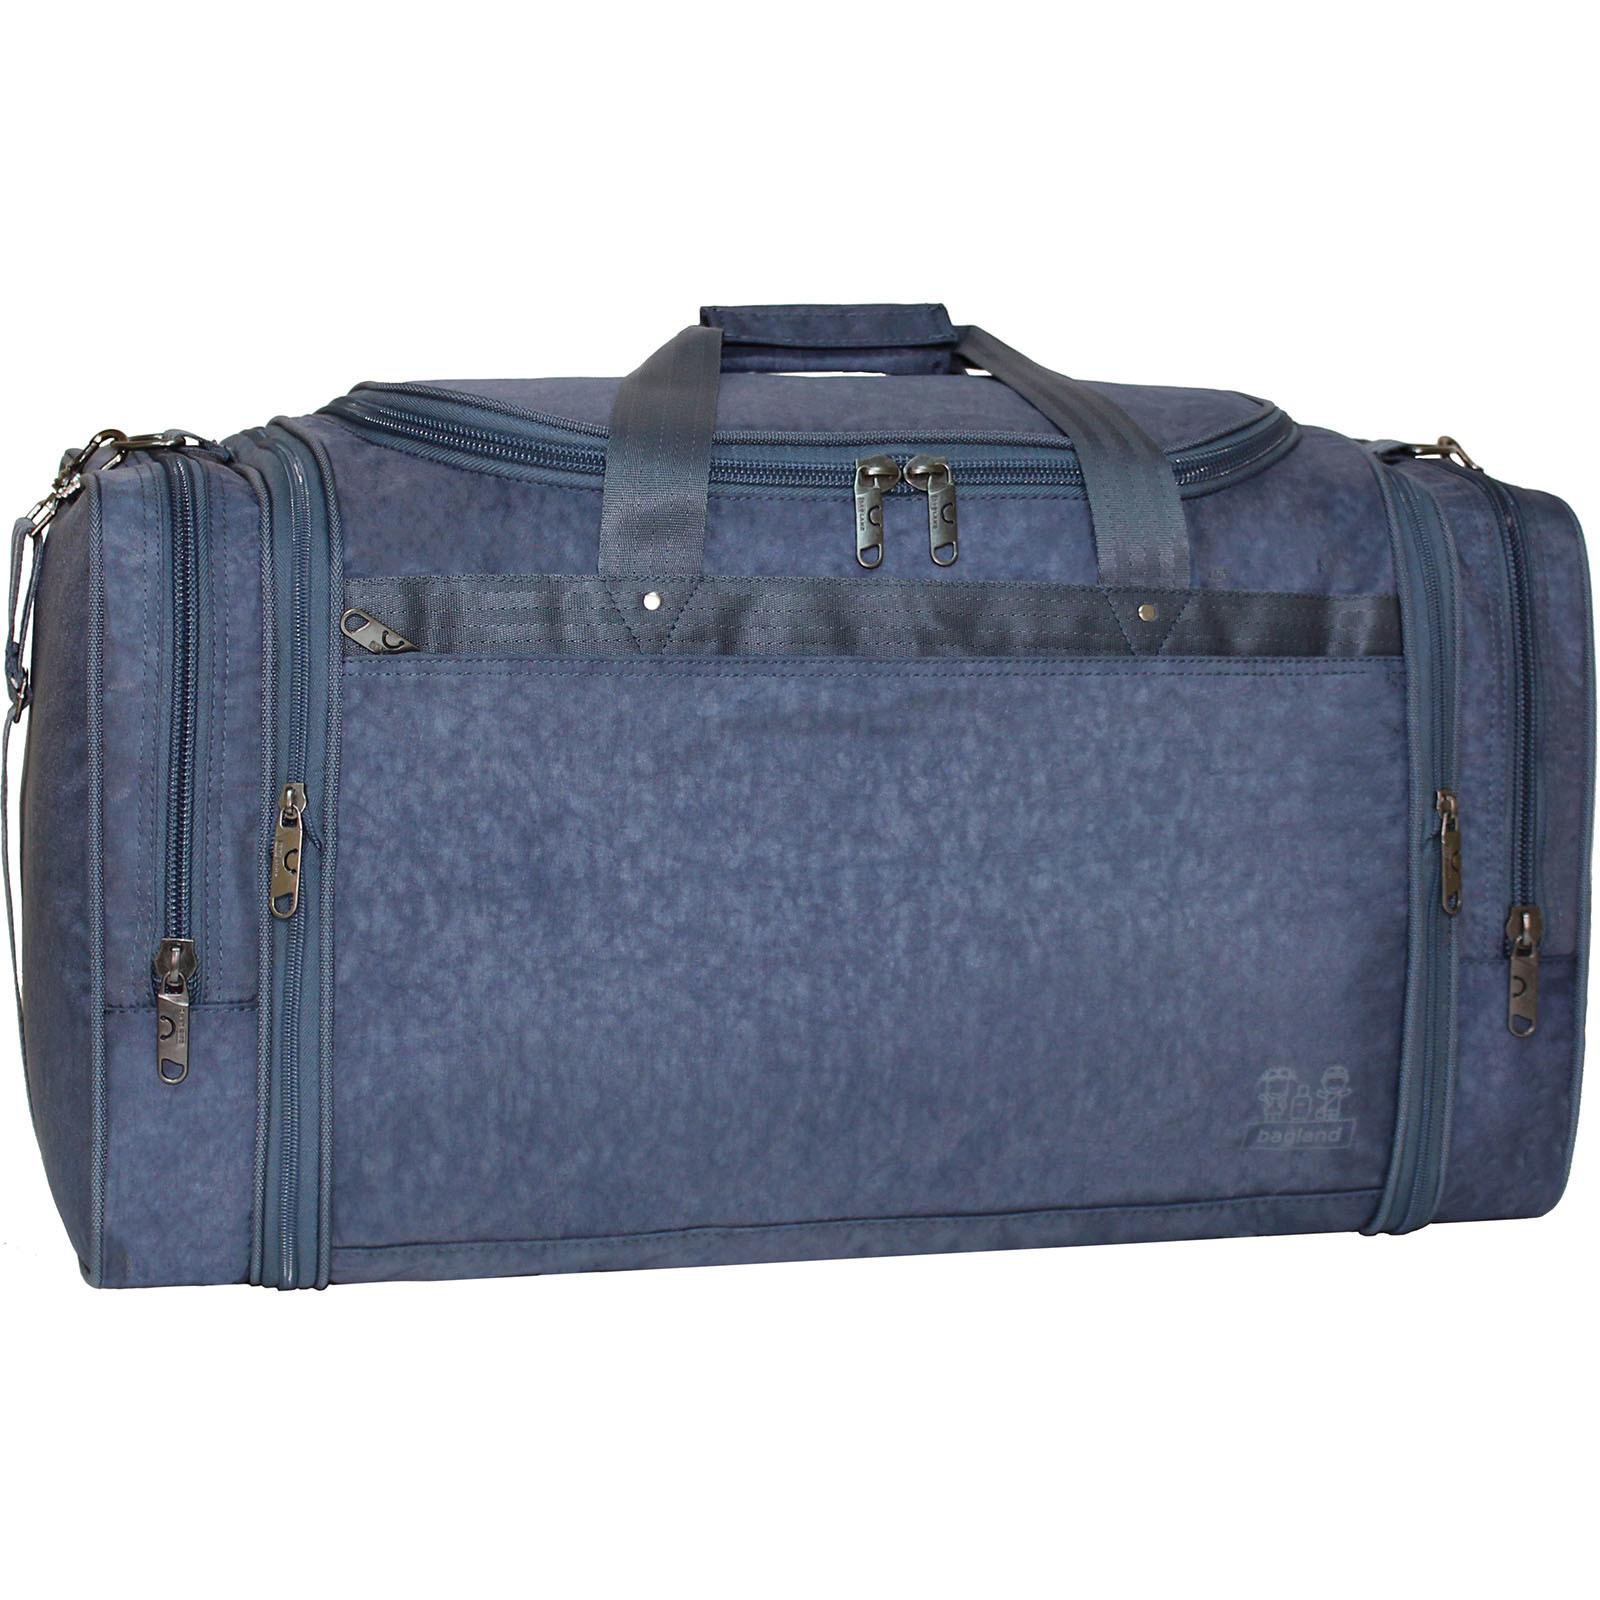 Дорожные сумки Спортивная сумка Bagland Мюнхен 59 л. Серый (0032570) IMG_1160_32570_.JPG